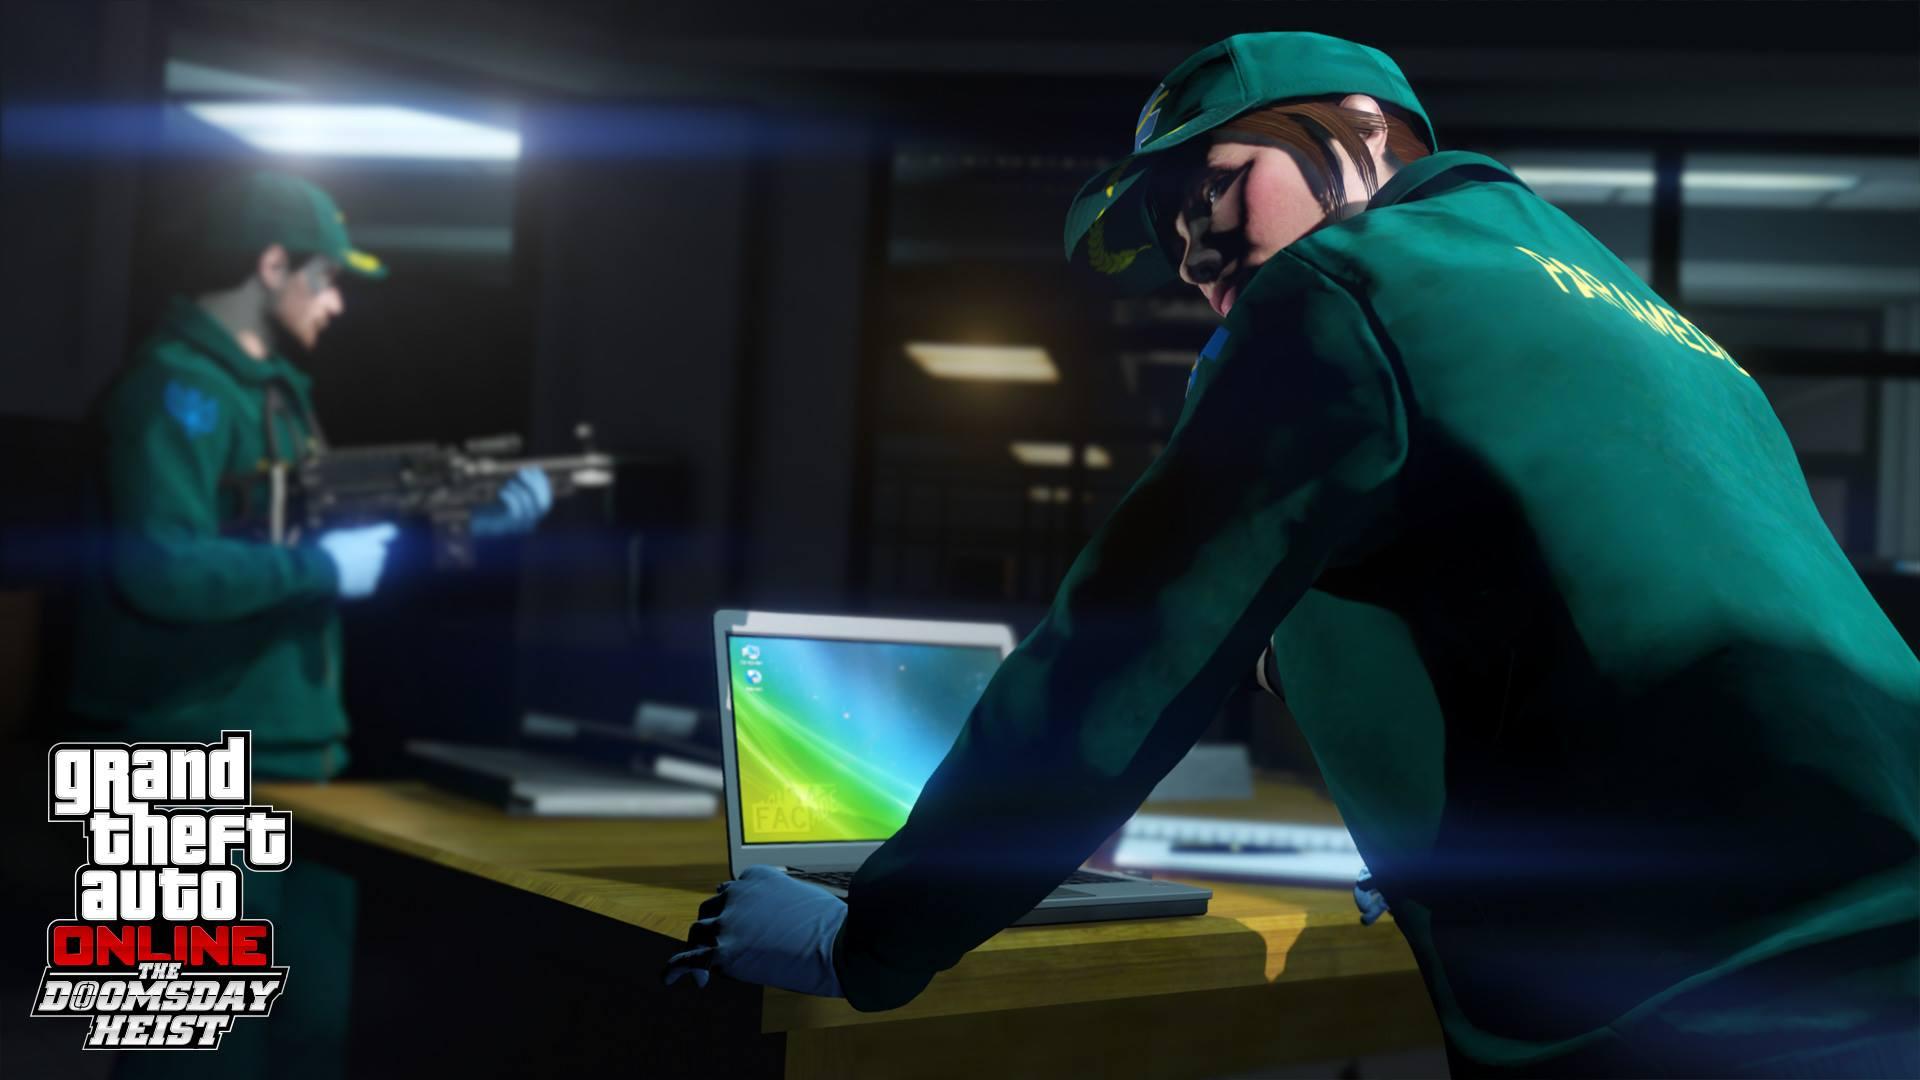 GTA Online Baquage Fin du Monde